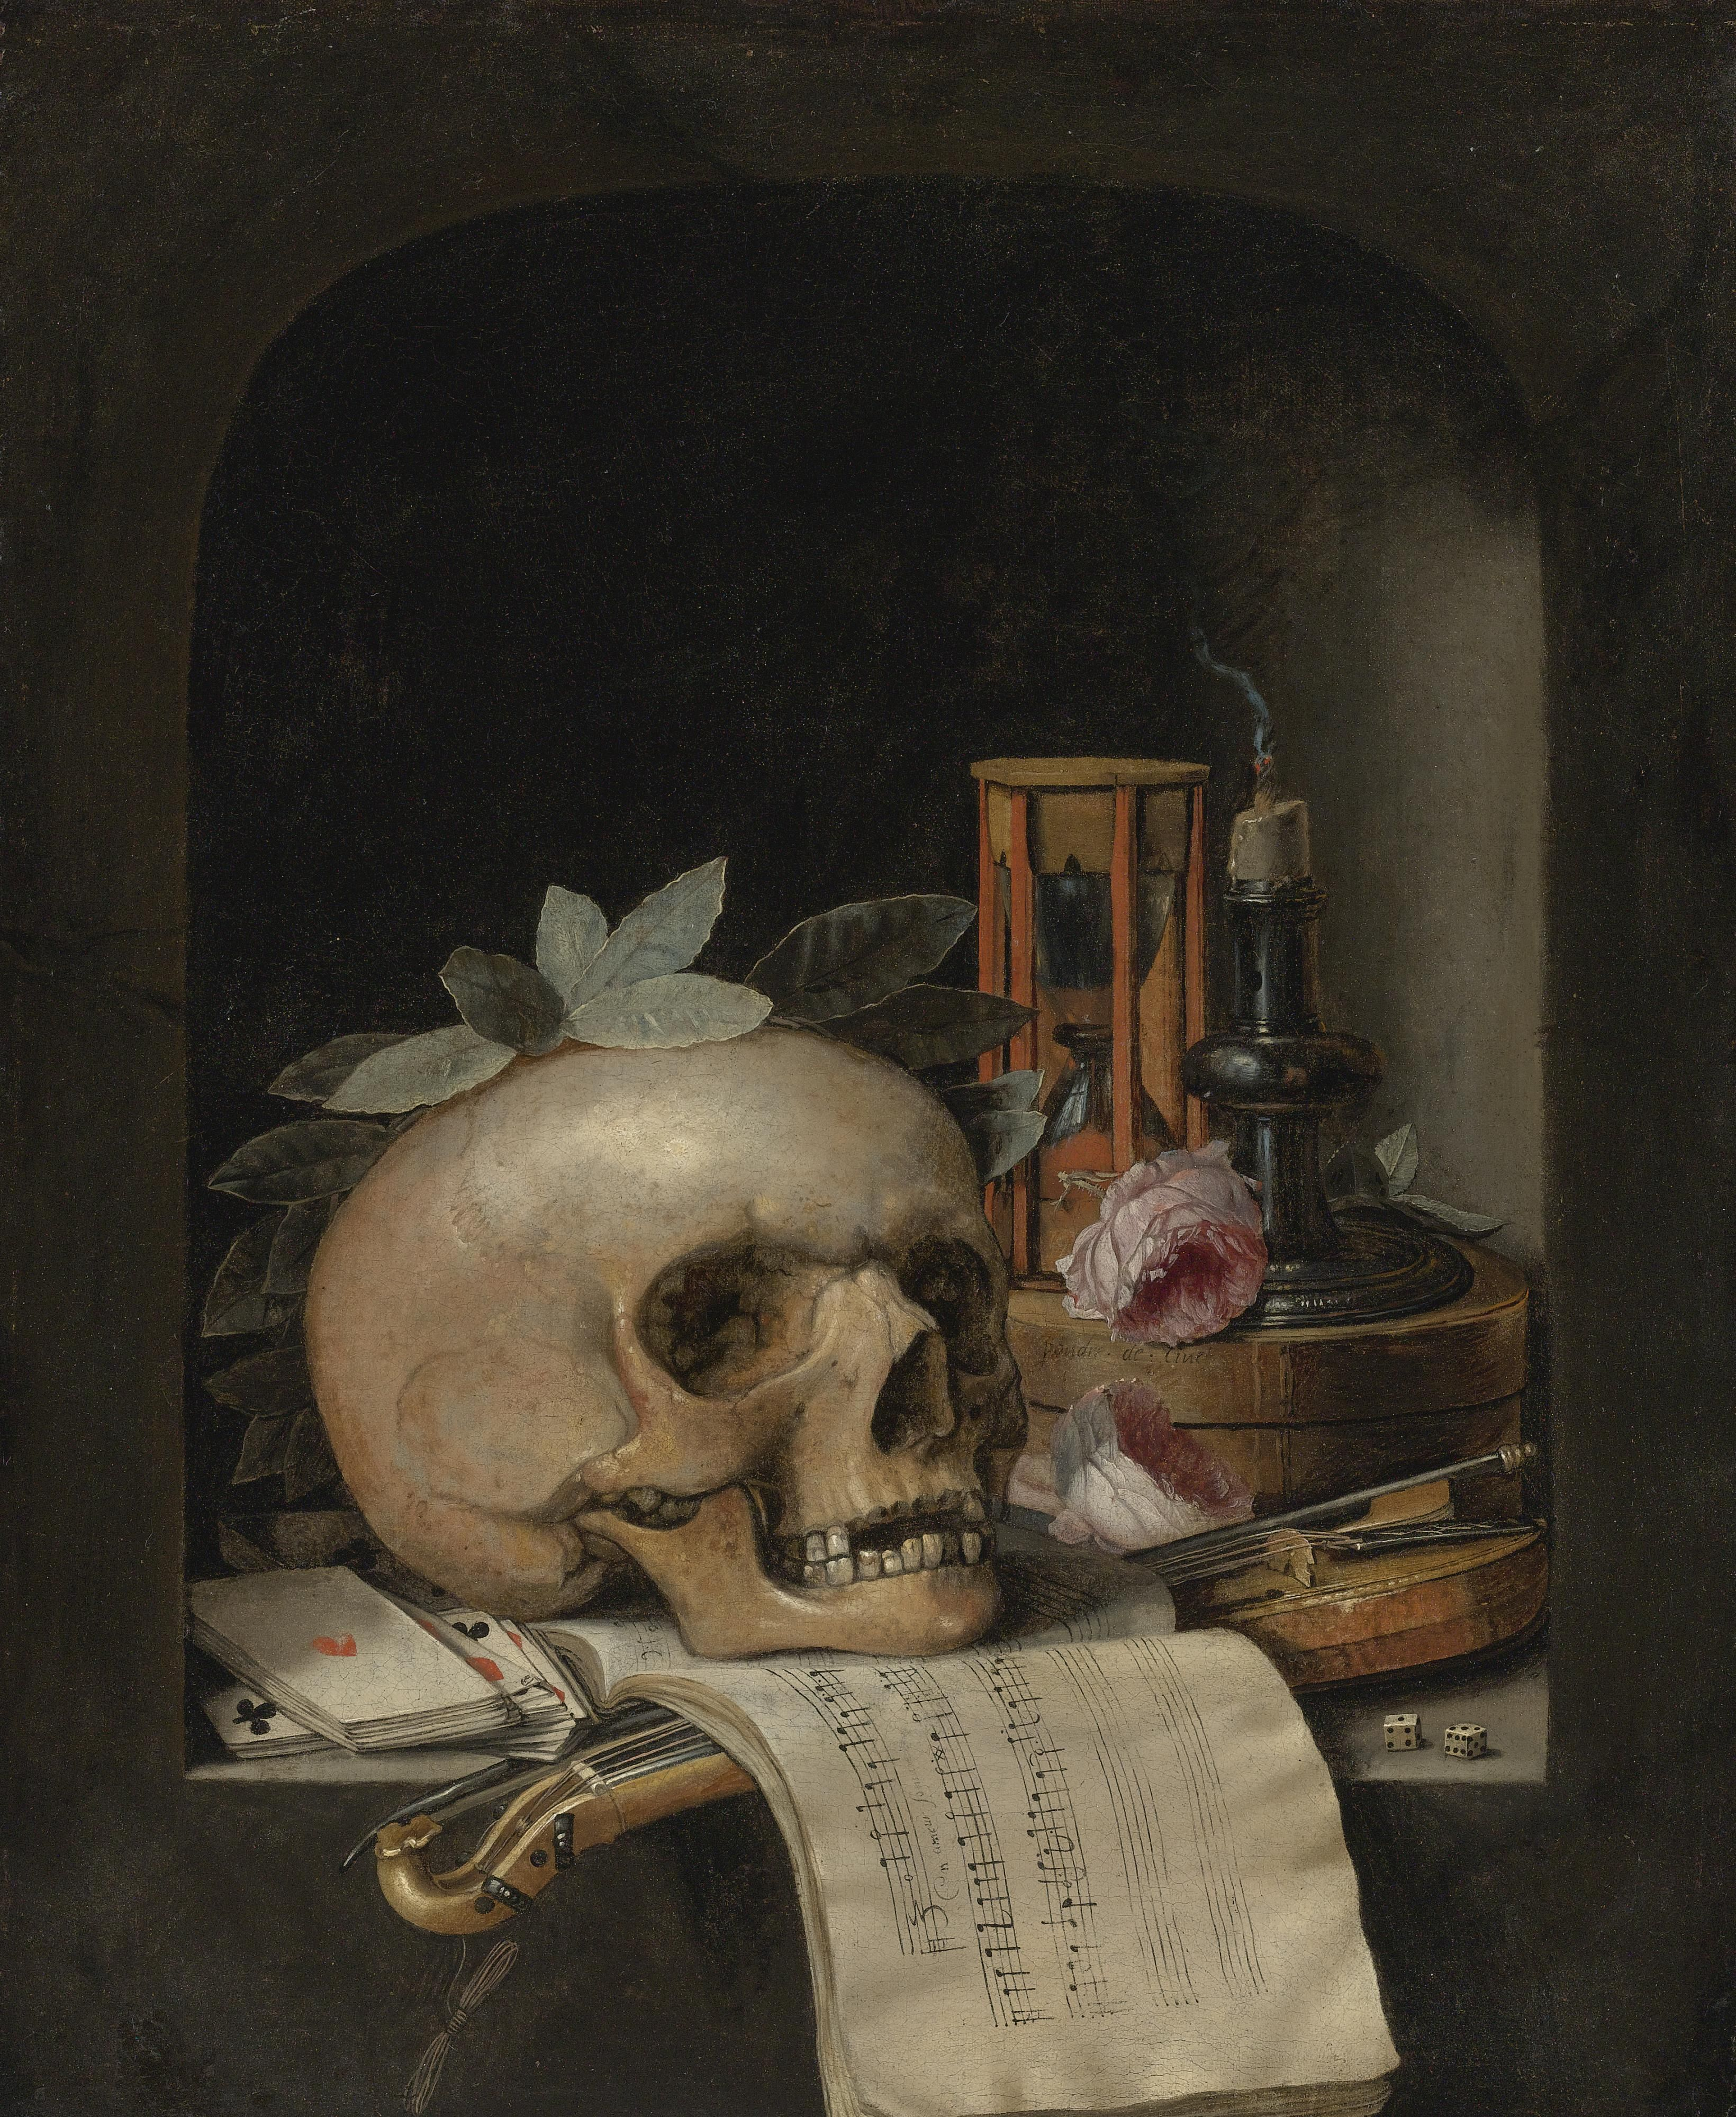 Simon renard de saint andr 1614 1677 vanit peinture m nature morte vanit - Vanite simon renard de saint andre ...